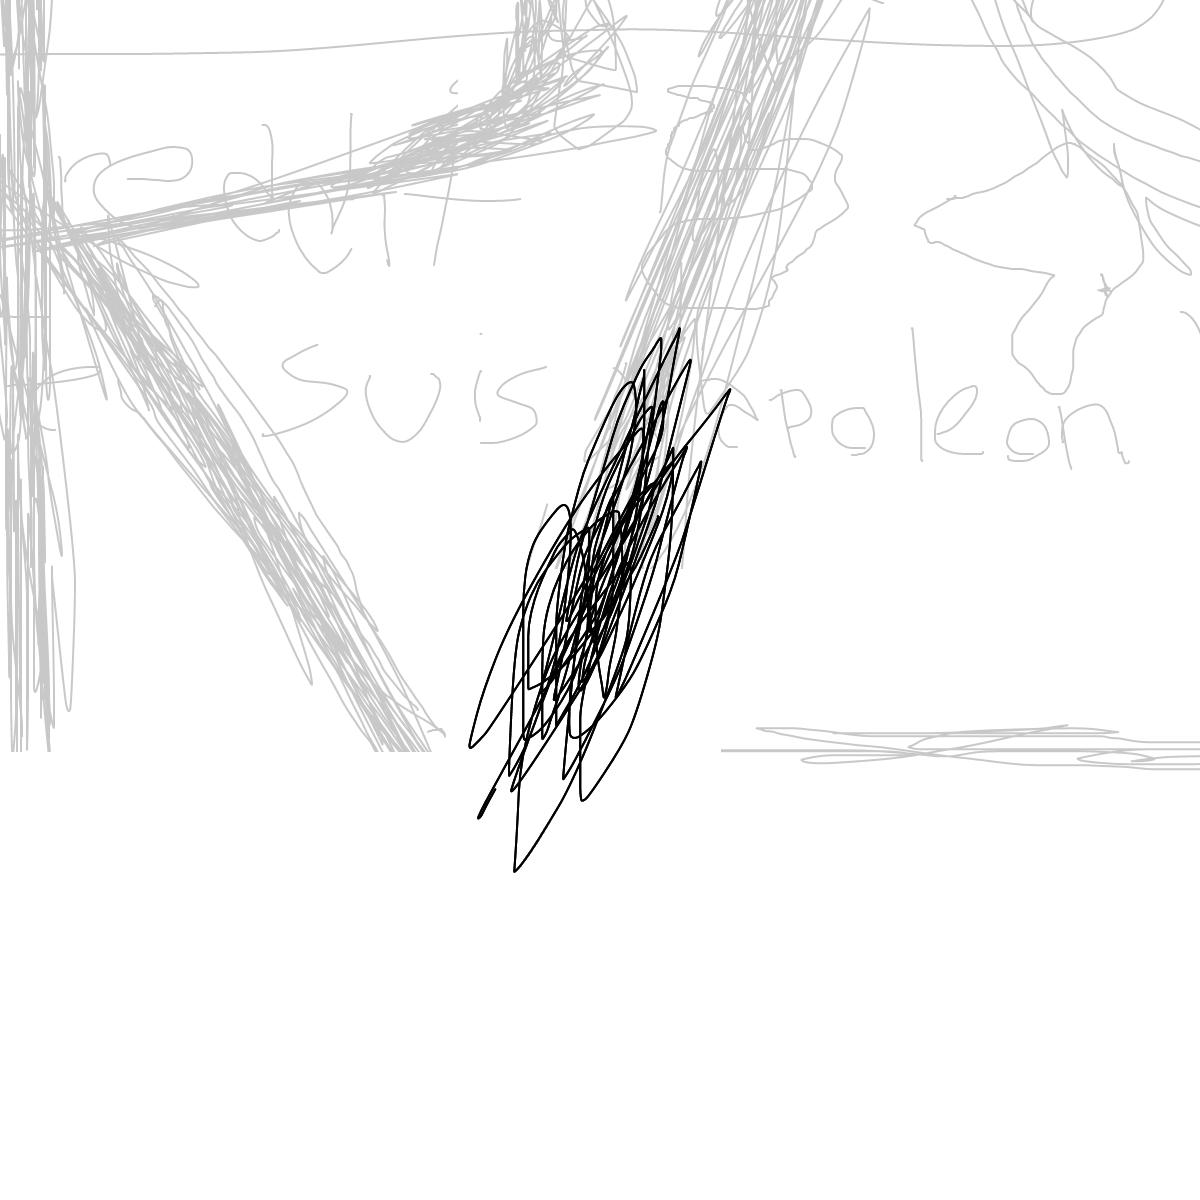 BAAAM drawing#7569 lat:-12.0500631332397460lng: -51.5040168762207000